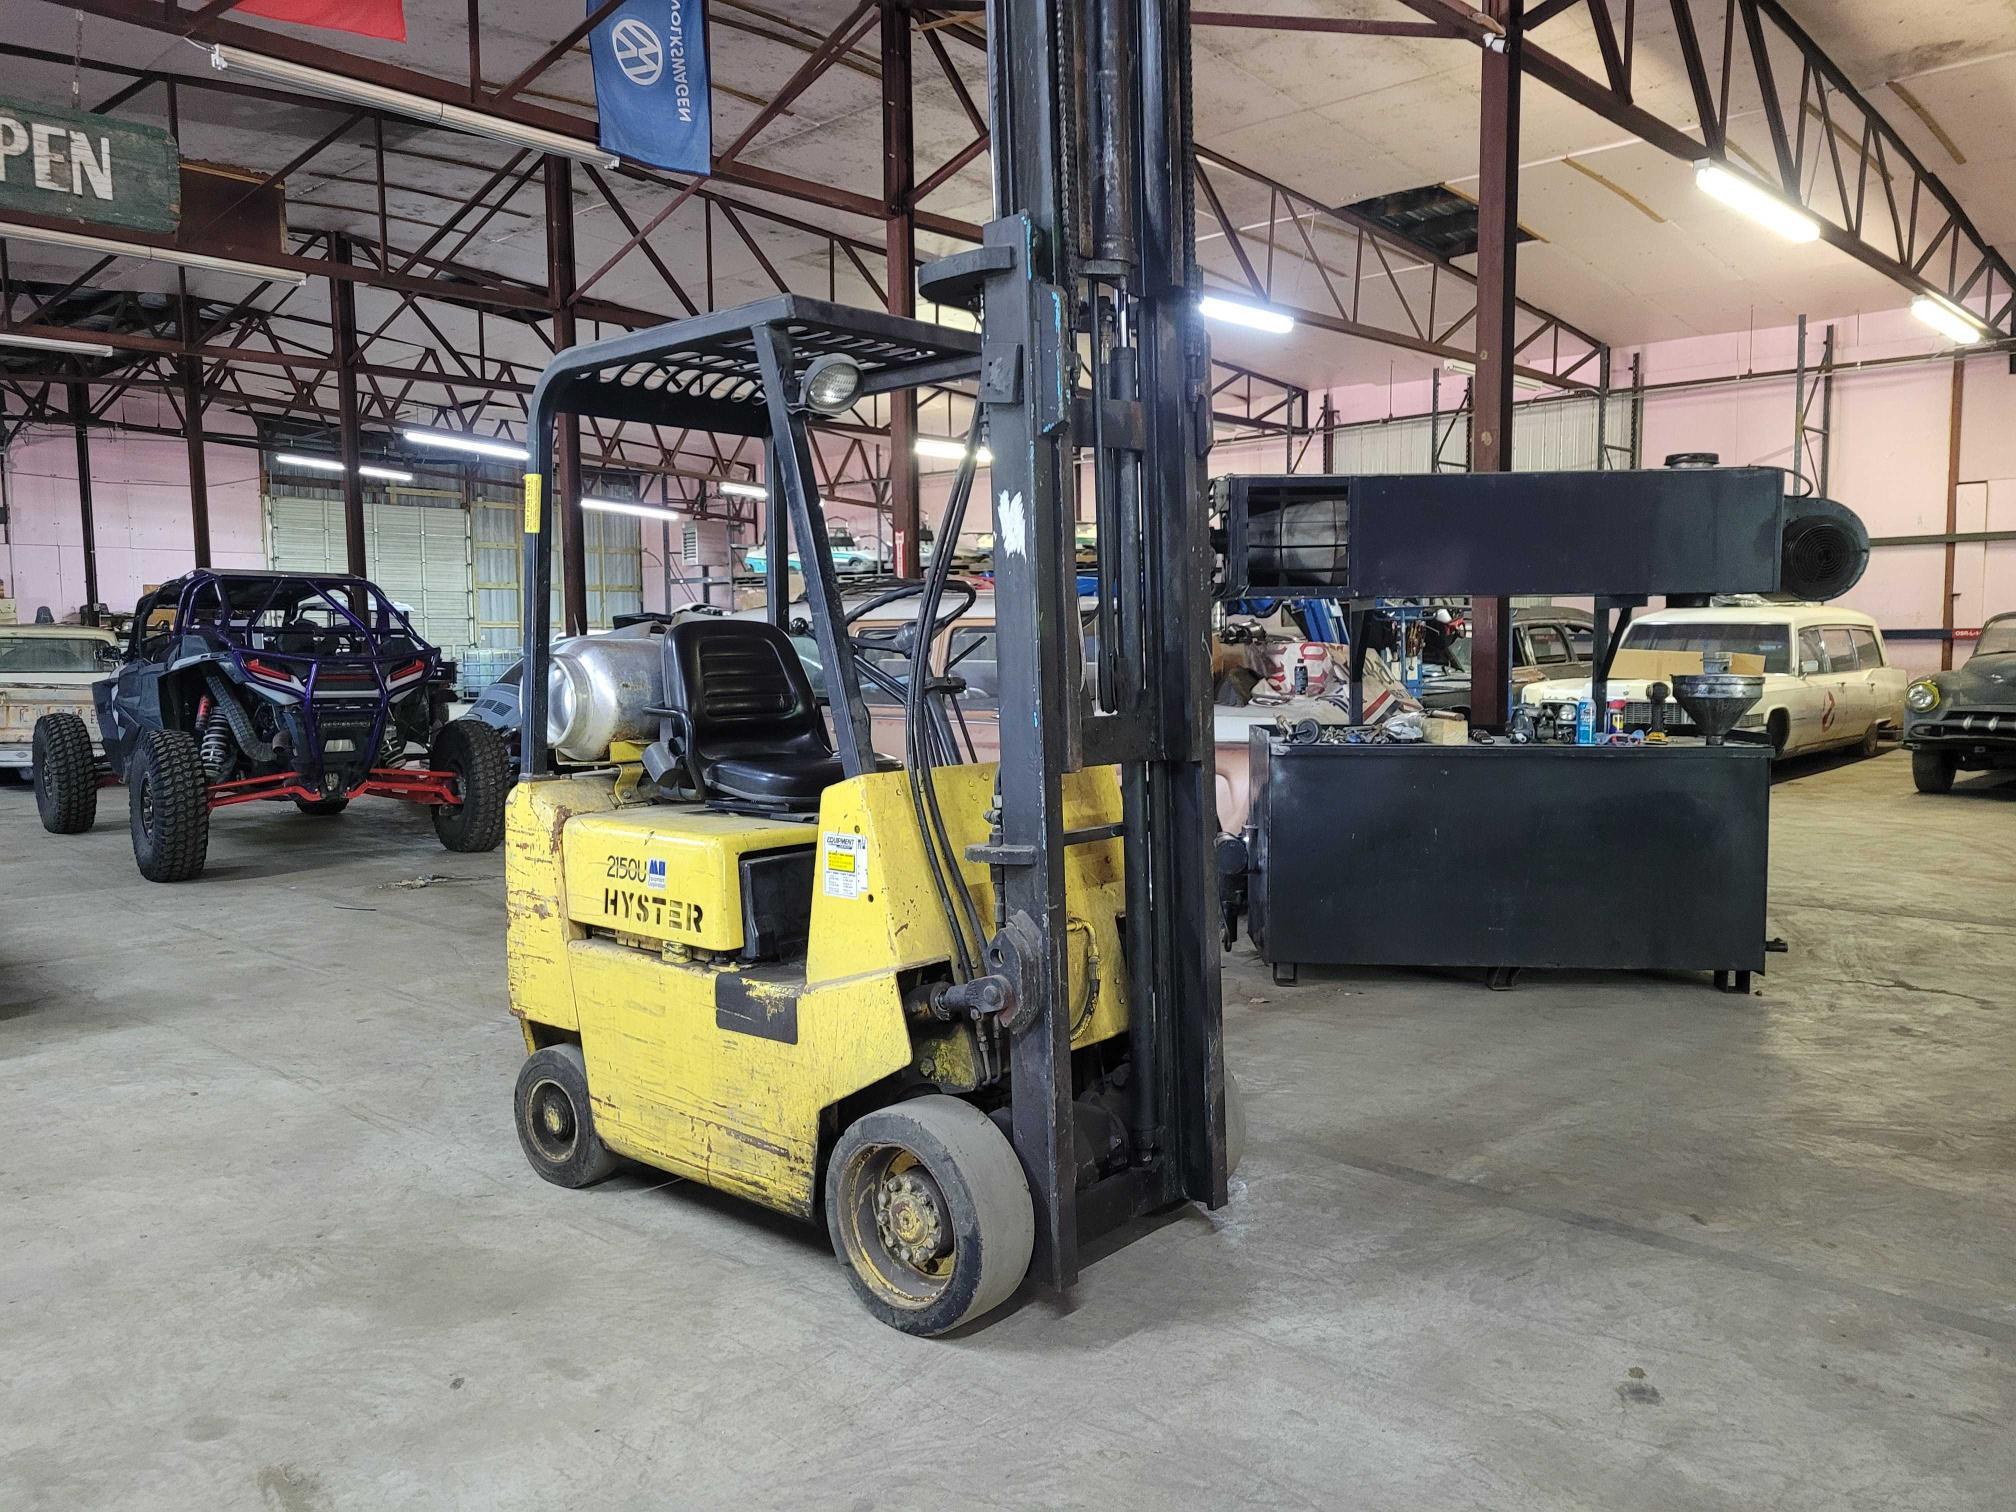 1998 Hyster Forklift en venta en Lebanon, TN